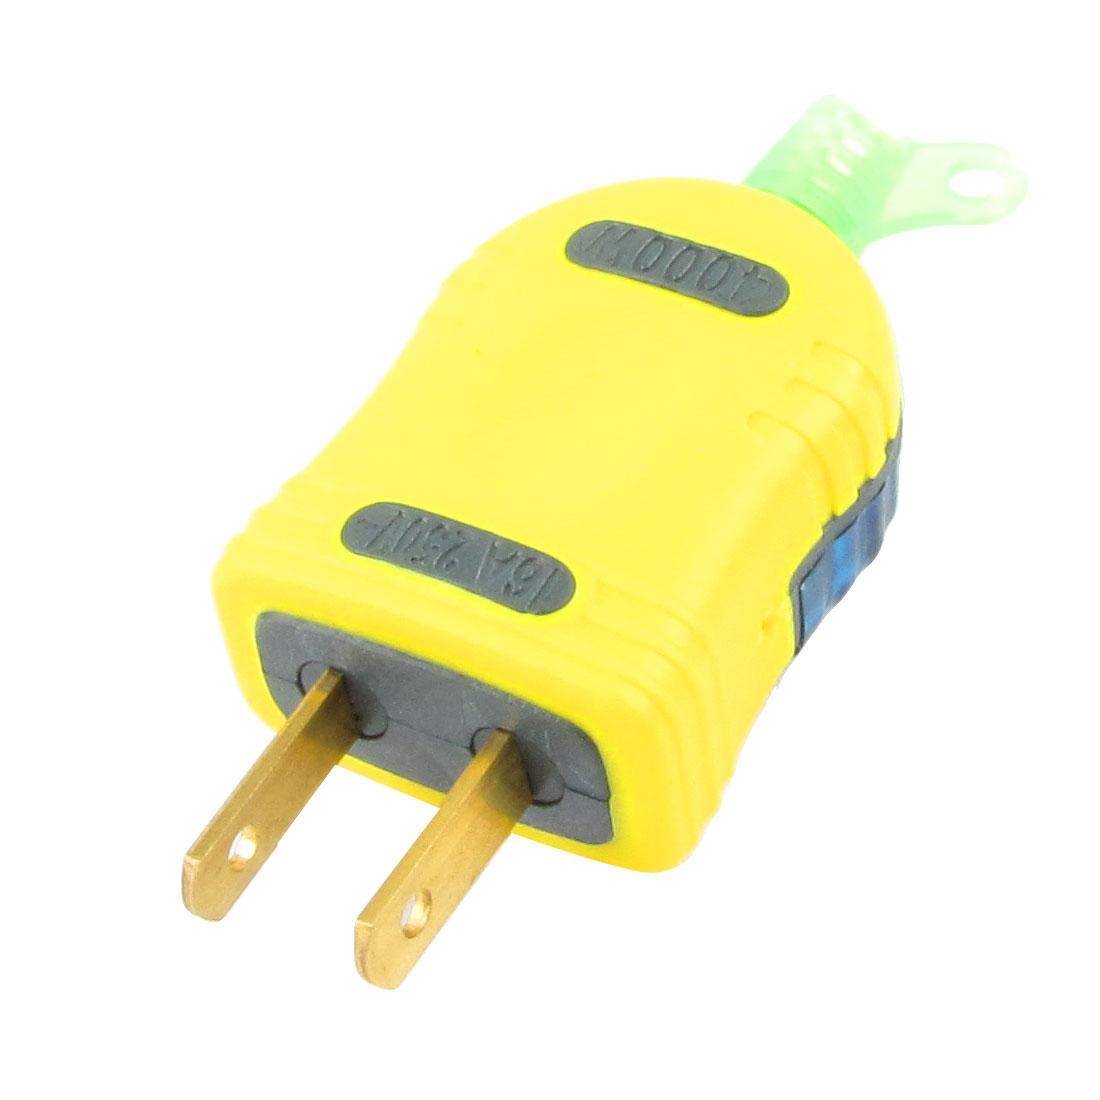 Blue Yellow Housing 2 Pin Power Adapter 250V 16A US AU Plug